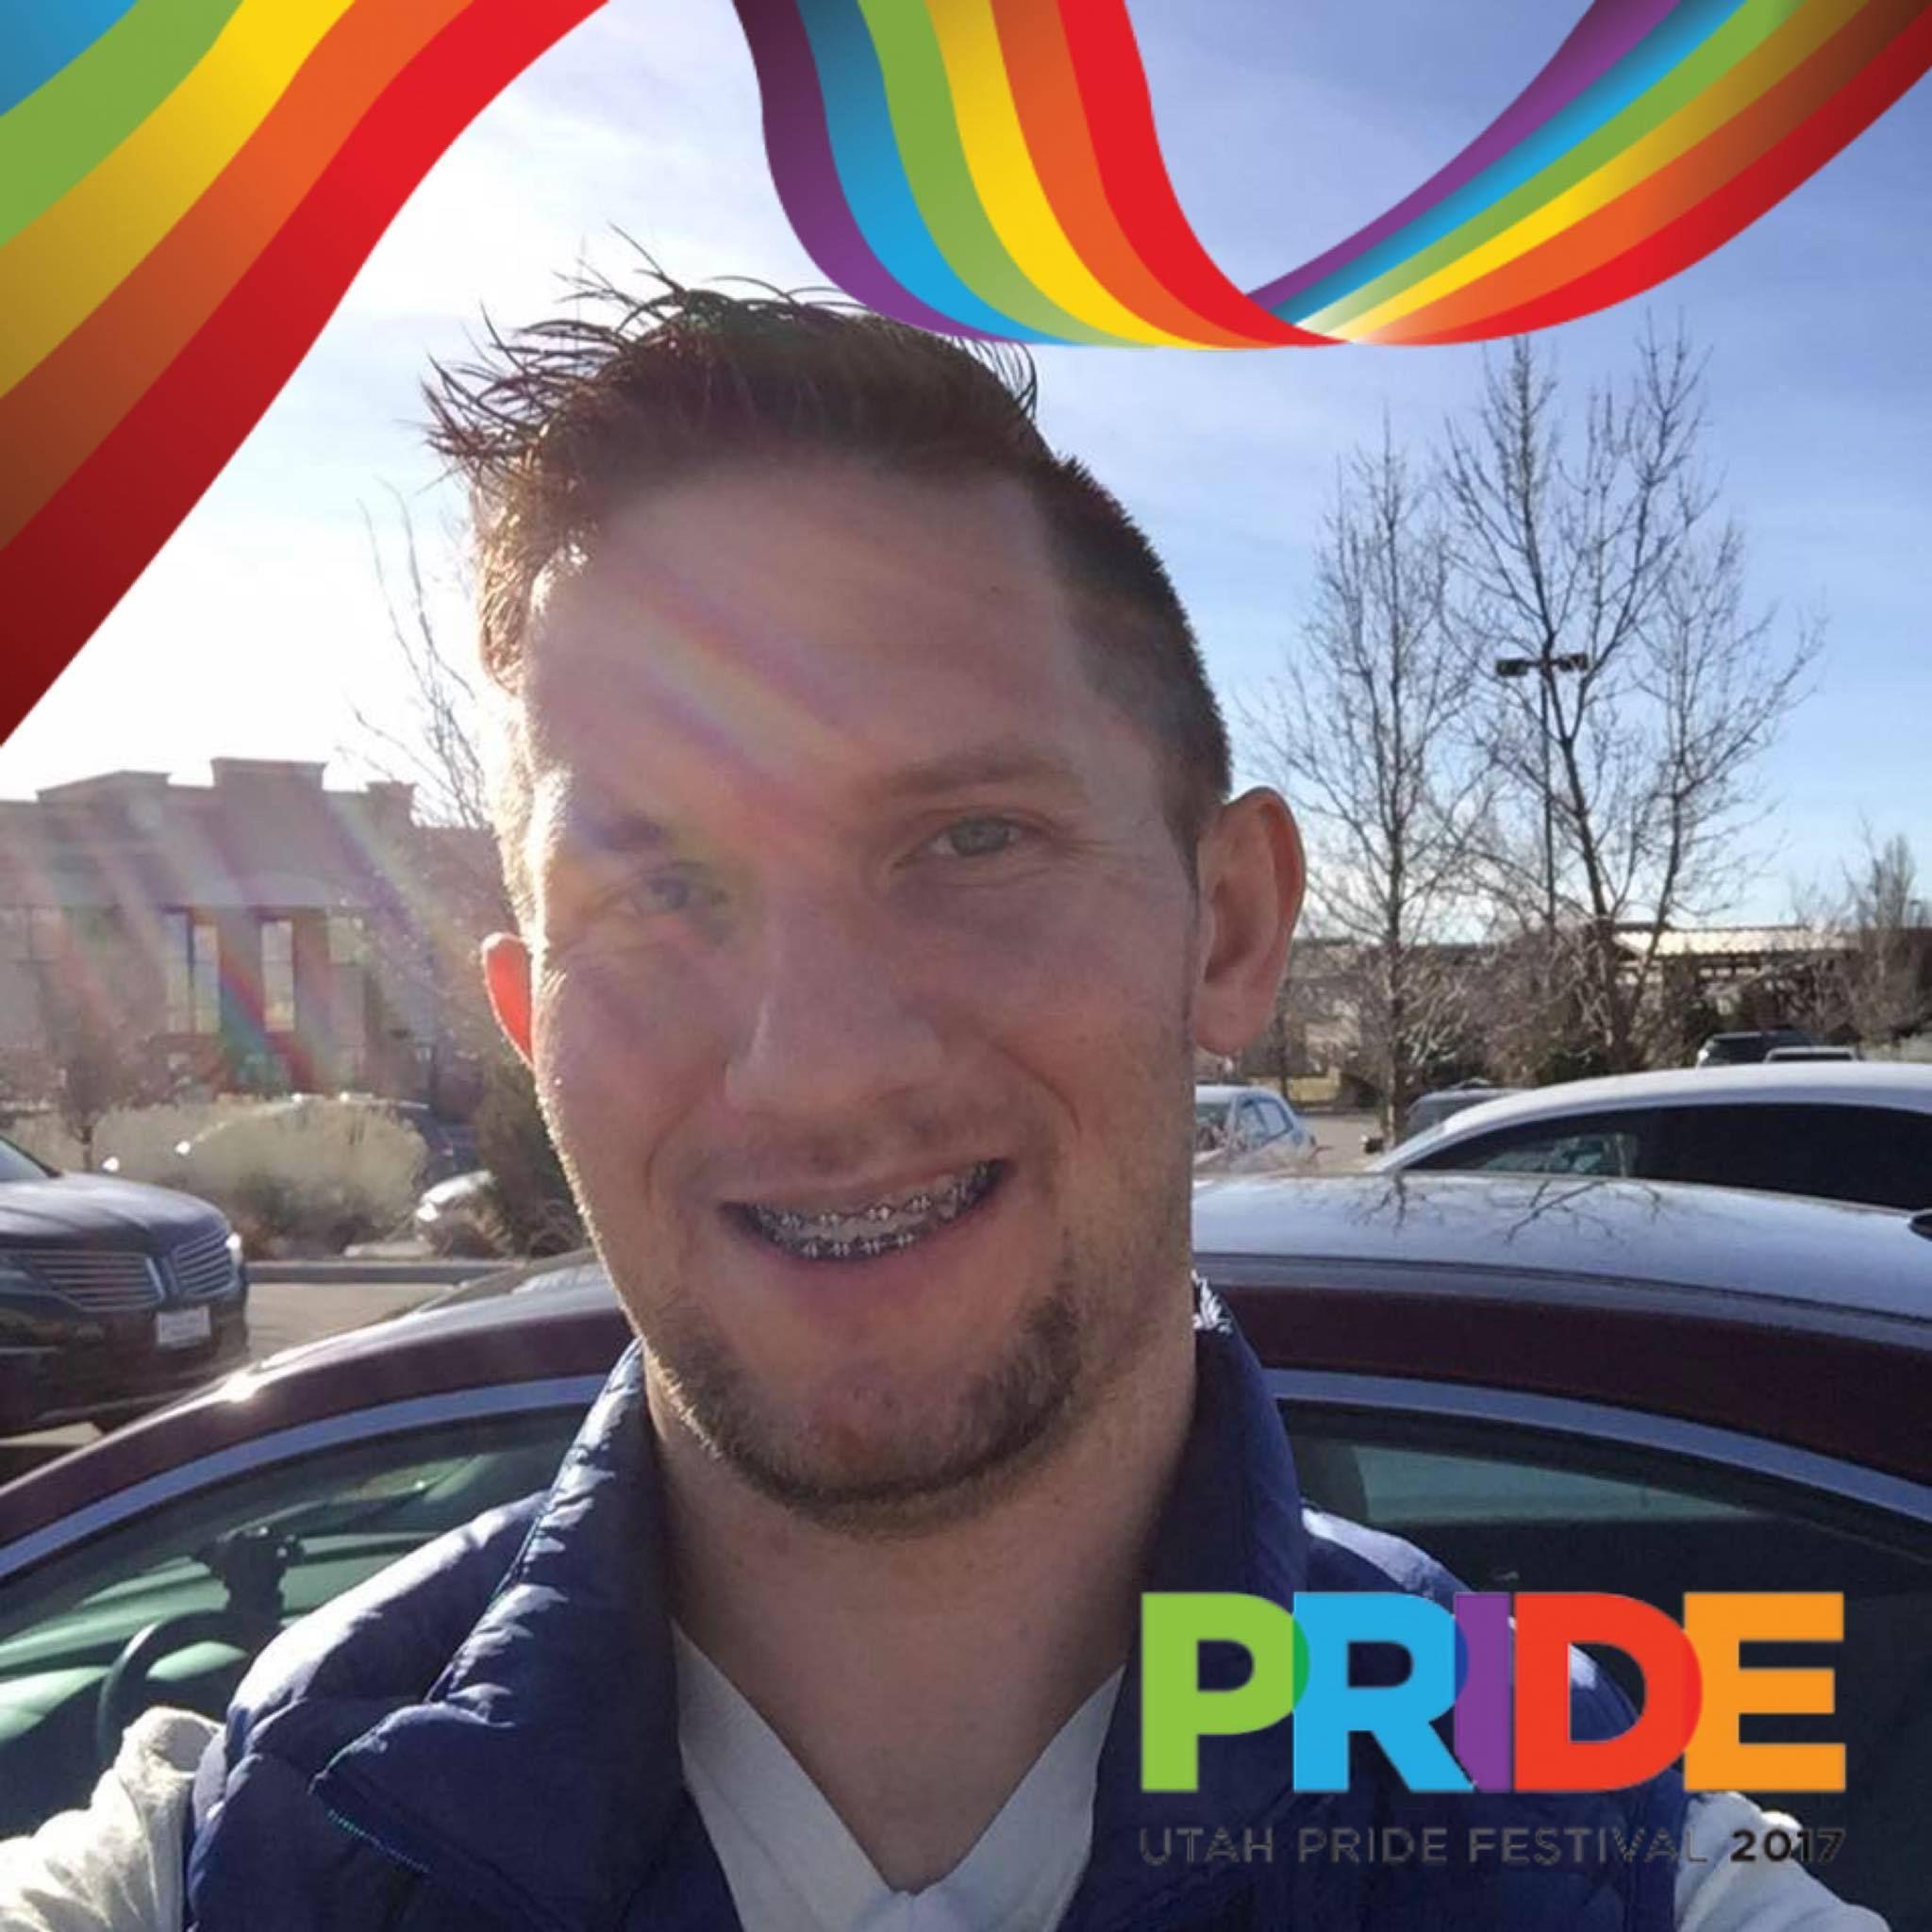 Craigslist Gay Meetup